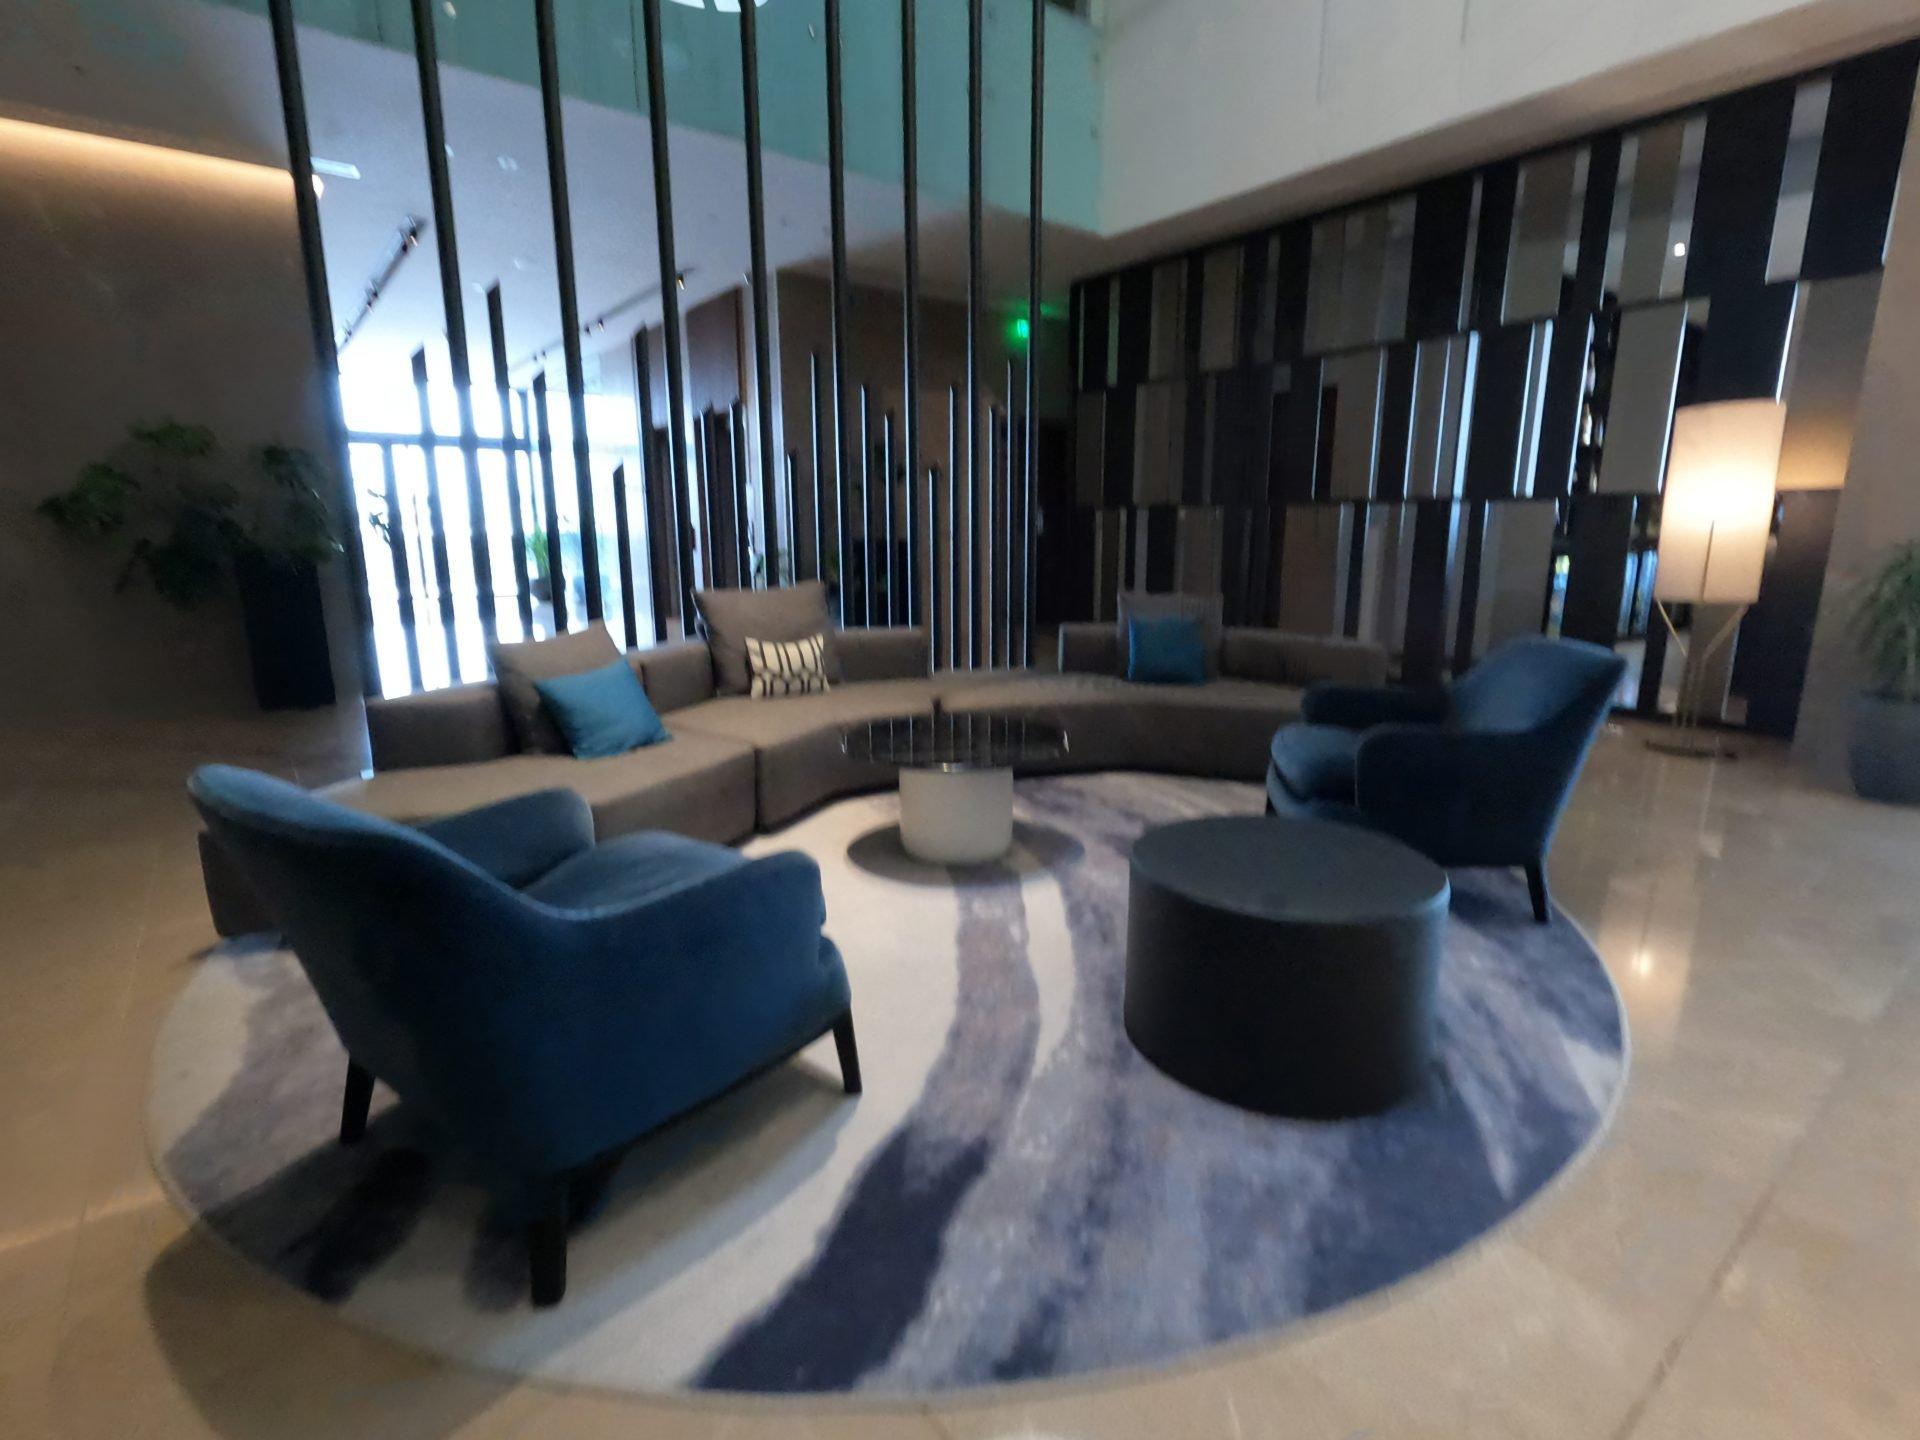 Radisson Blu Hotel, Larnaca Review - Lobby